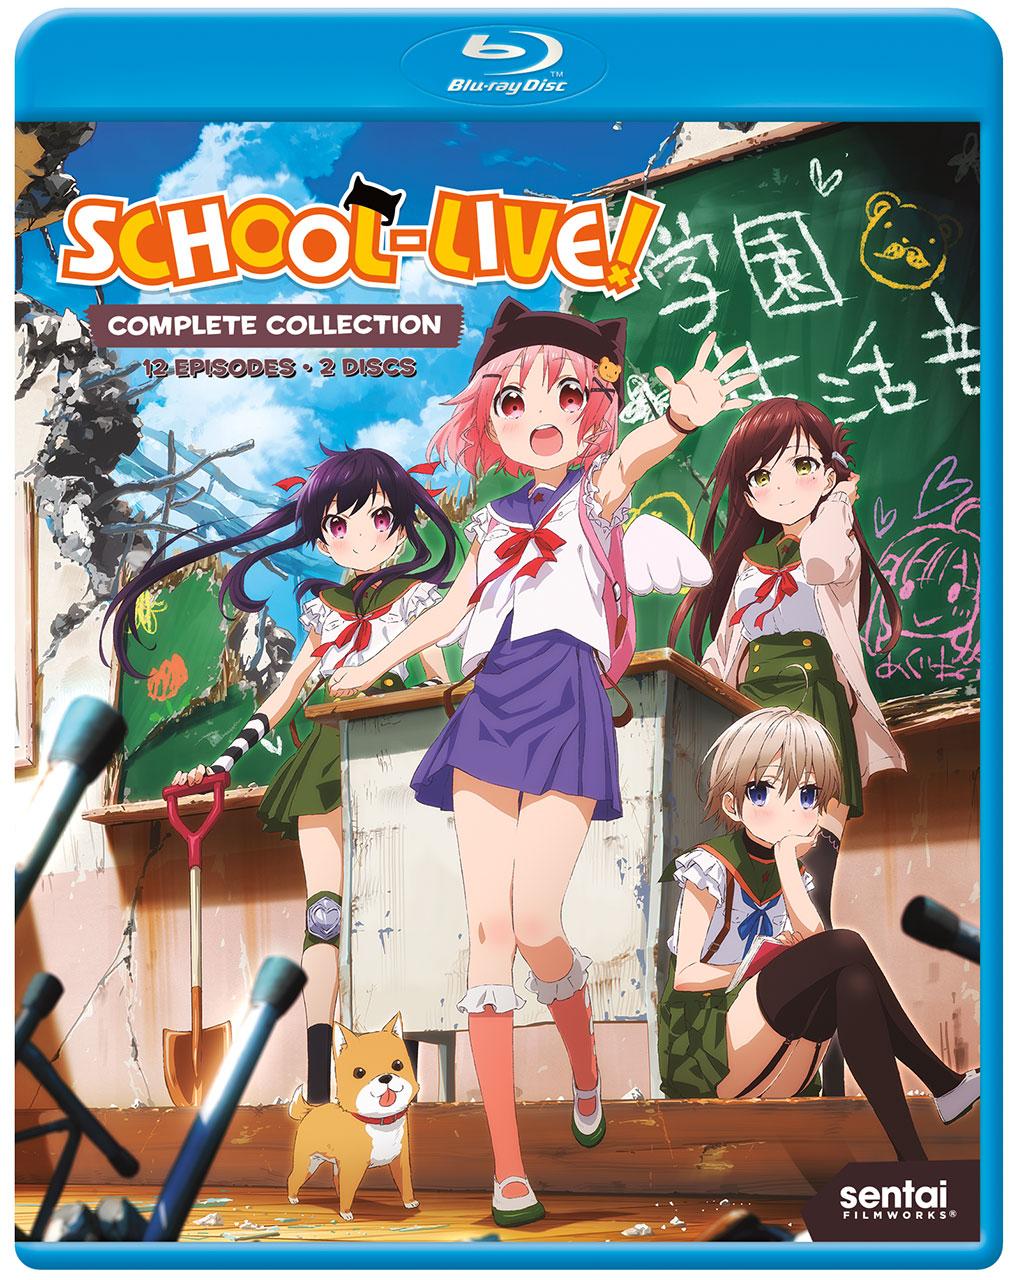 SCHOOL-LIVE! Blu-ray 816726026107